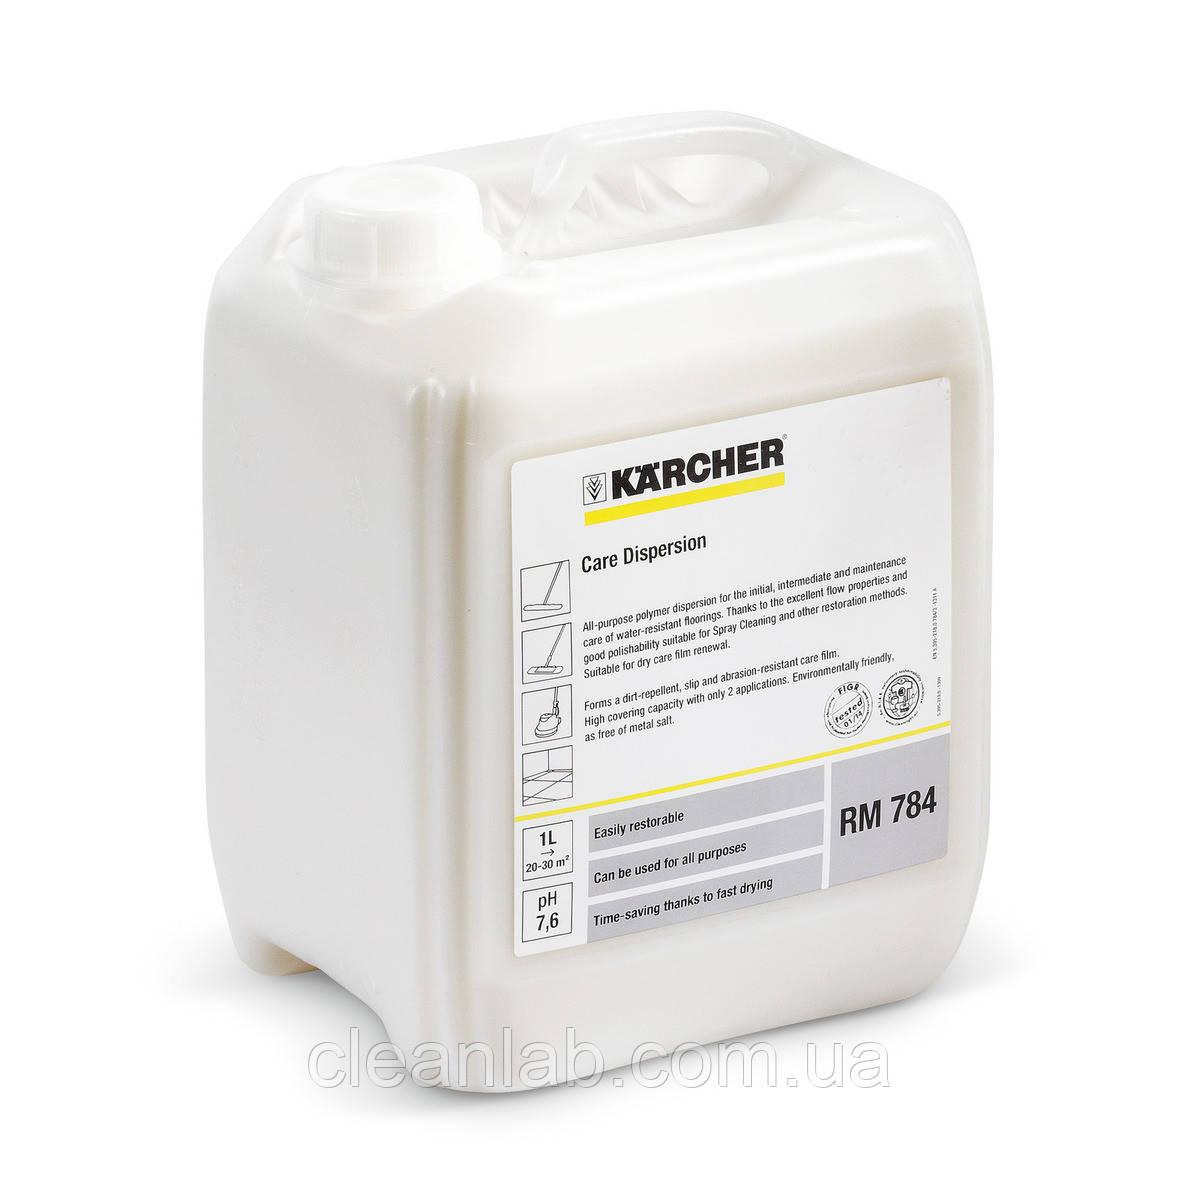 Karcher RM 784 , 5 L , защитная дисперсия